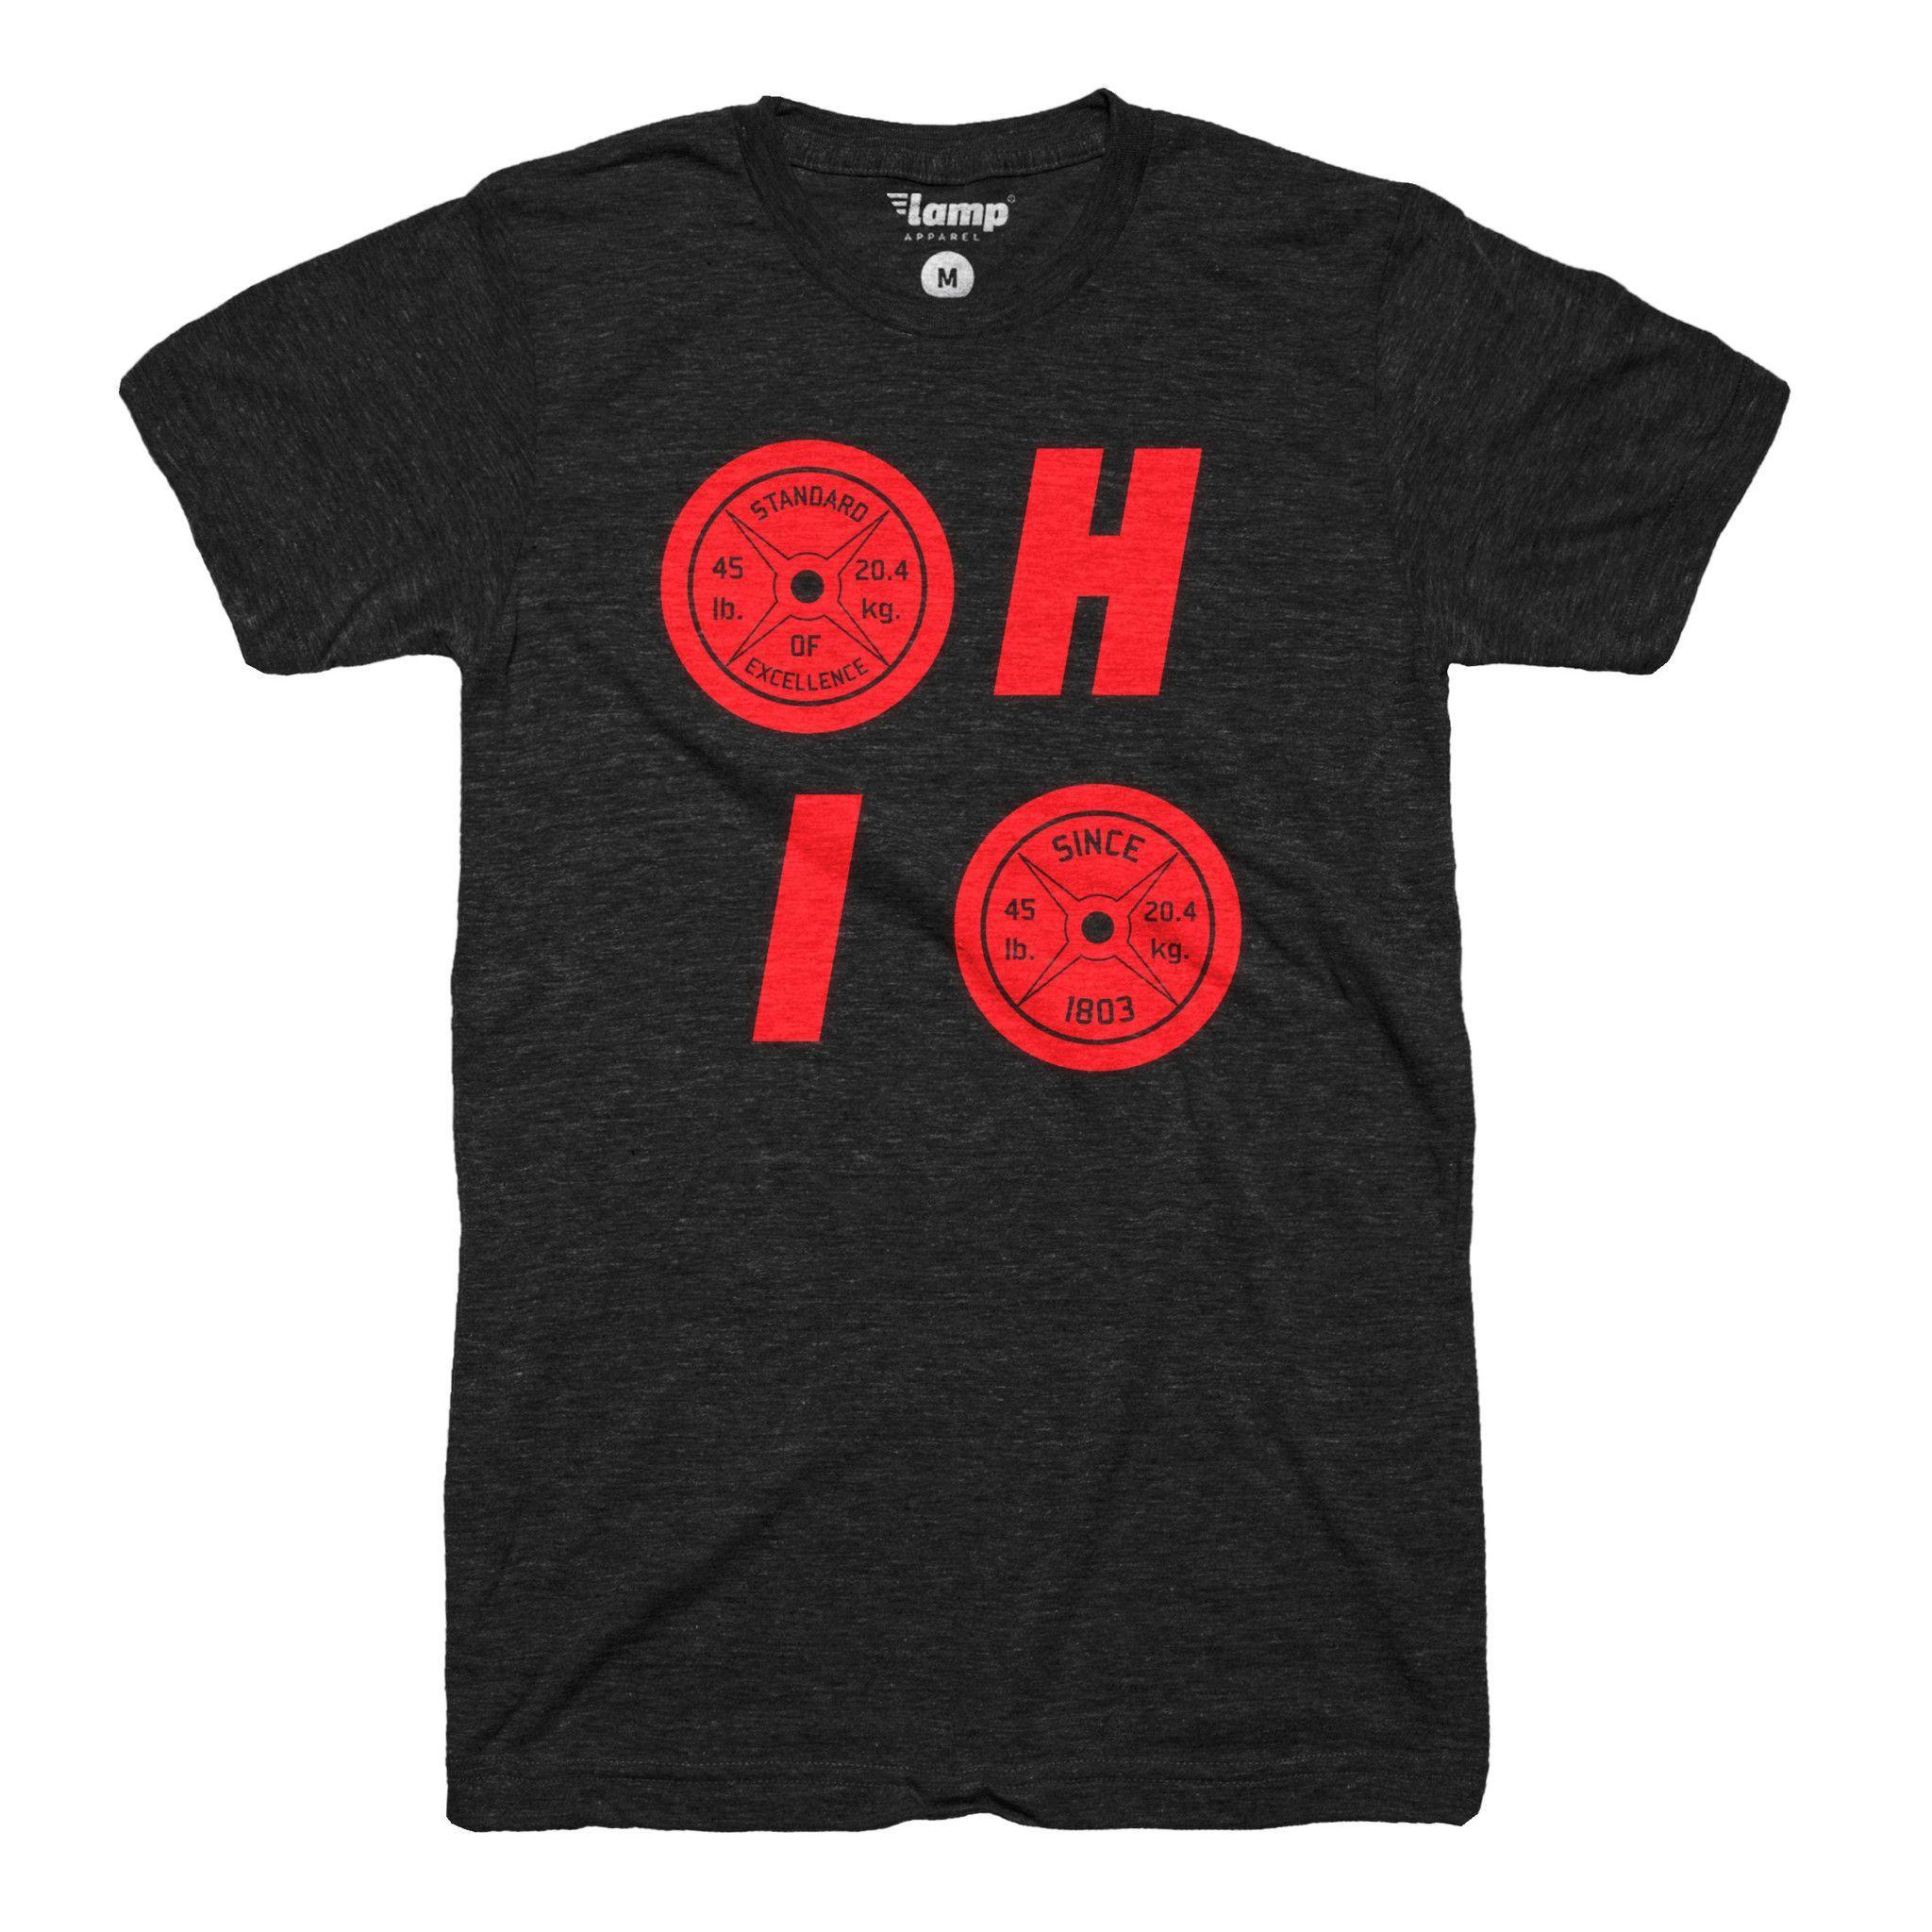 Lift Up Ohio Shirt Ohio shirt, Online clothing, Mens tops